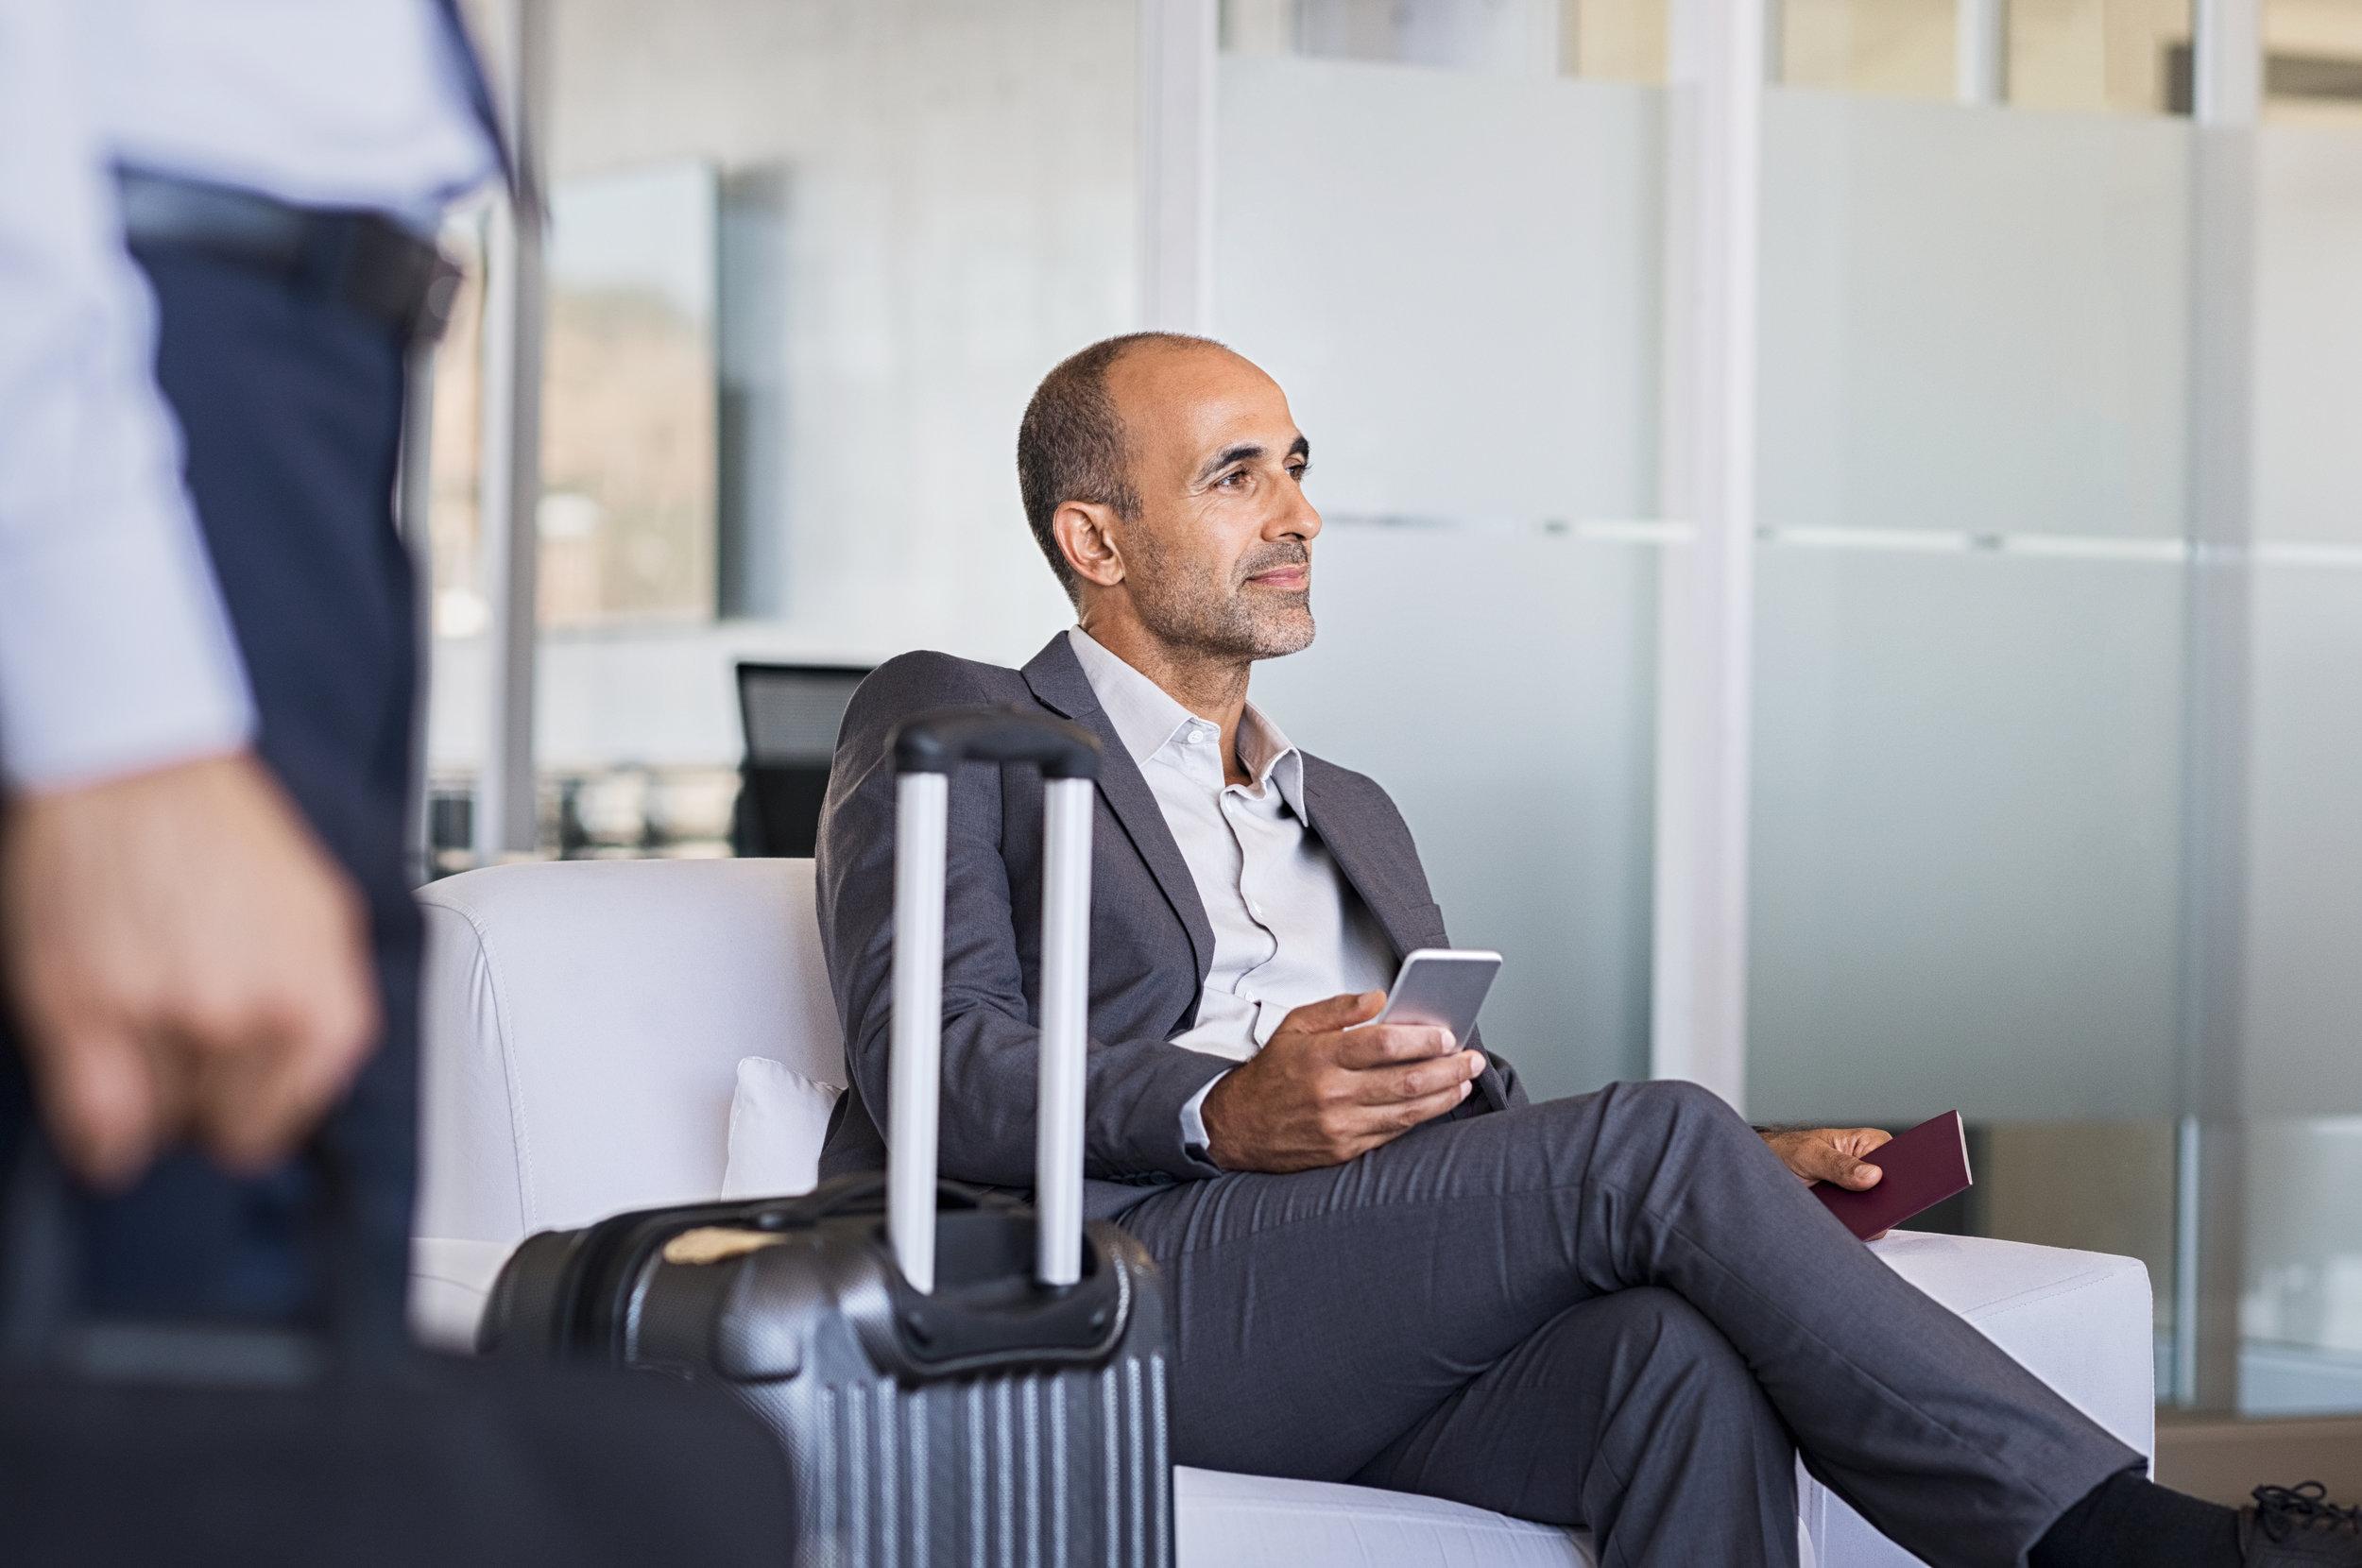 Businessman-waiting-at-airport-842865090_6144x4080.jpeg